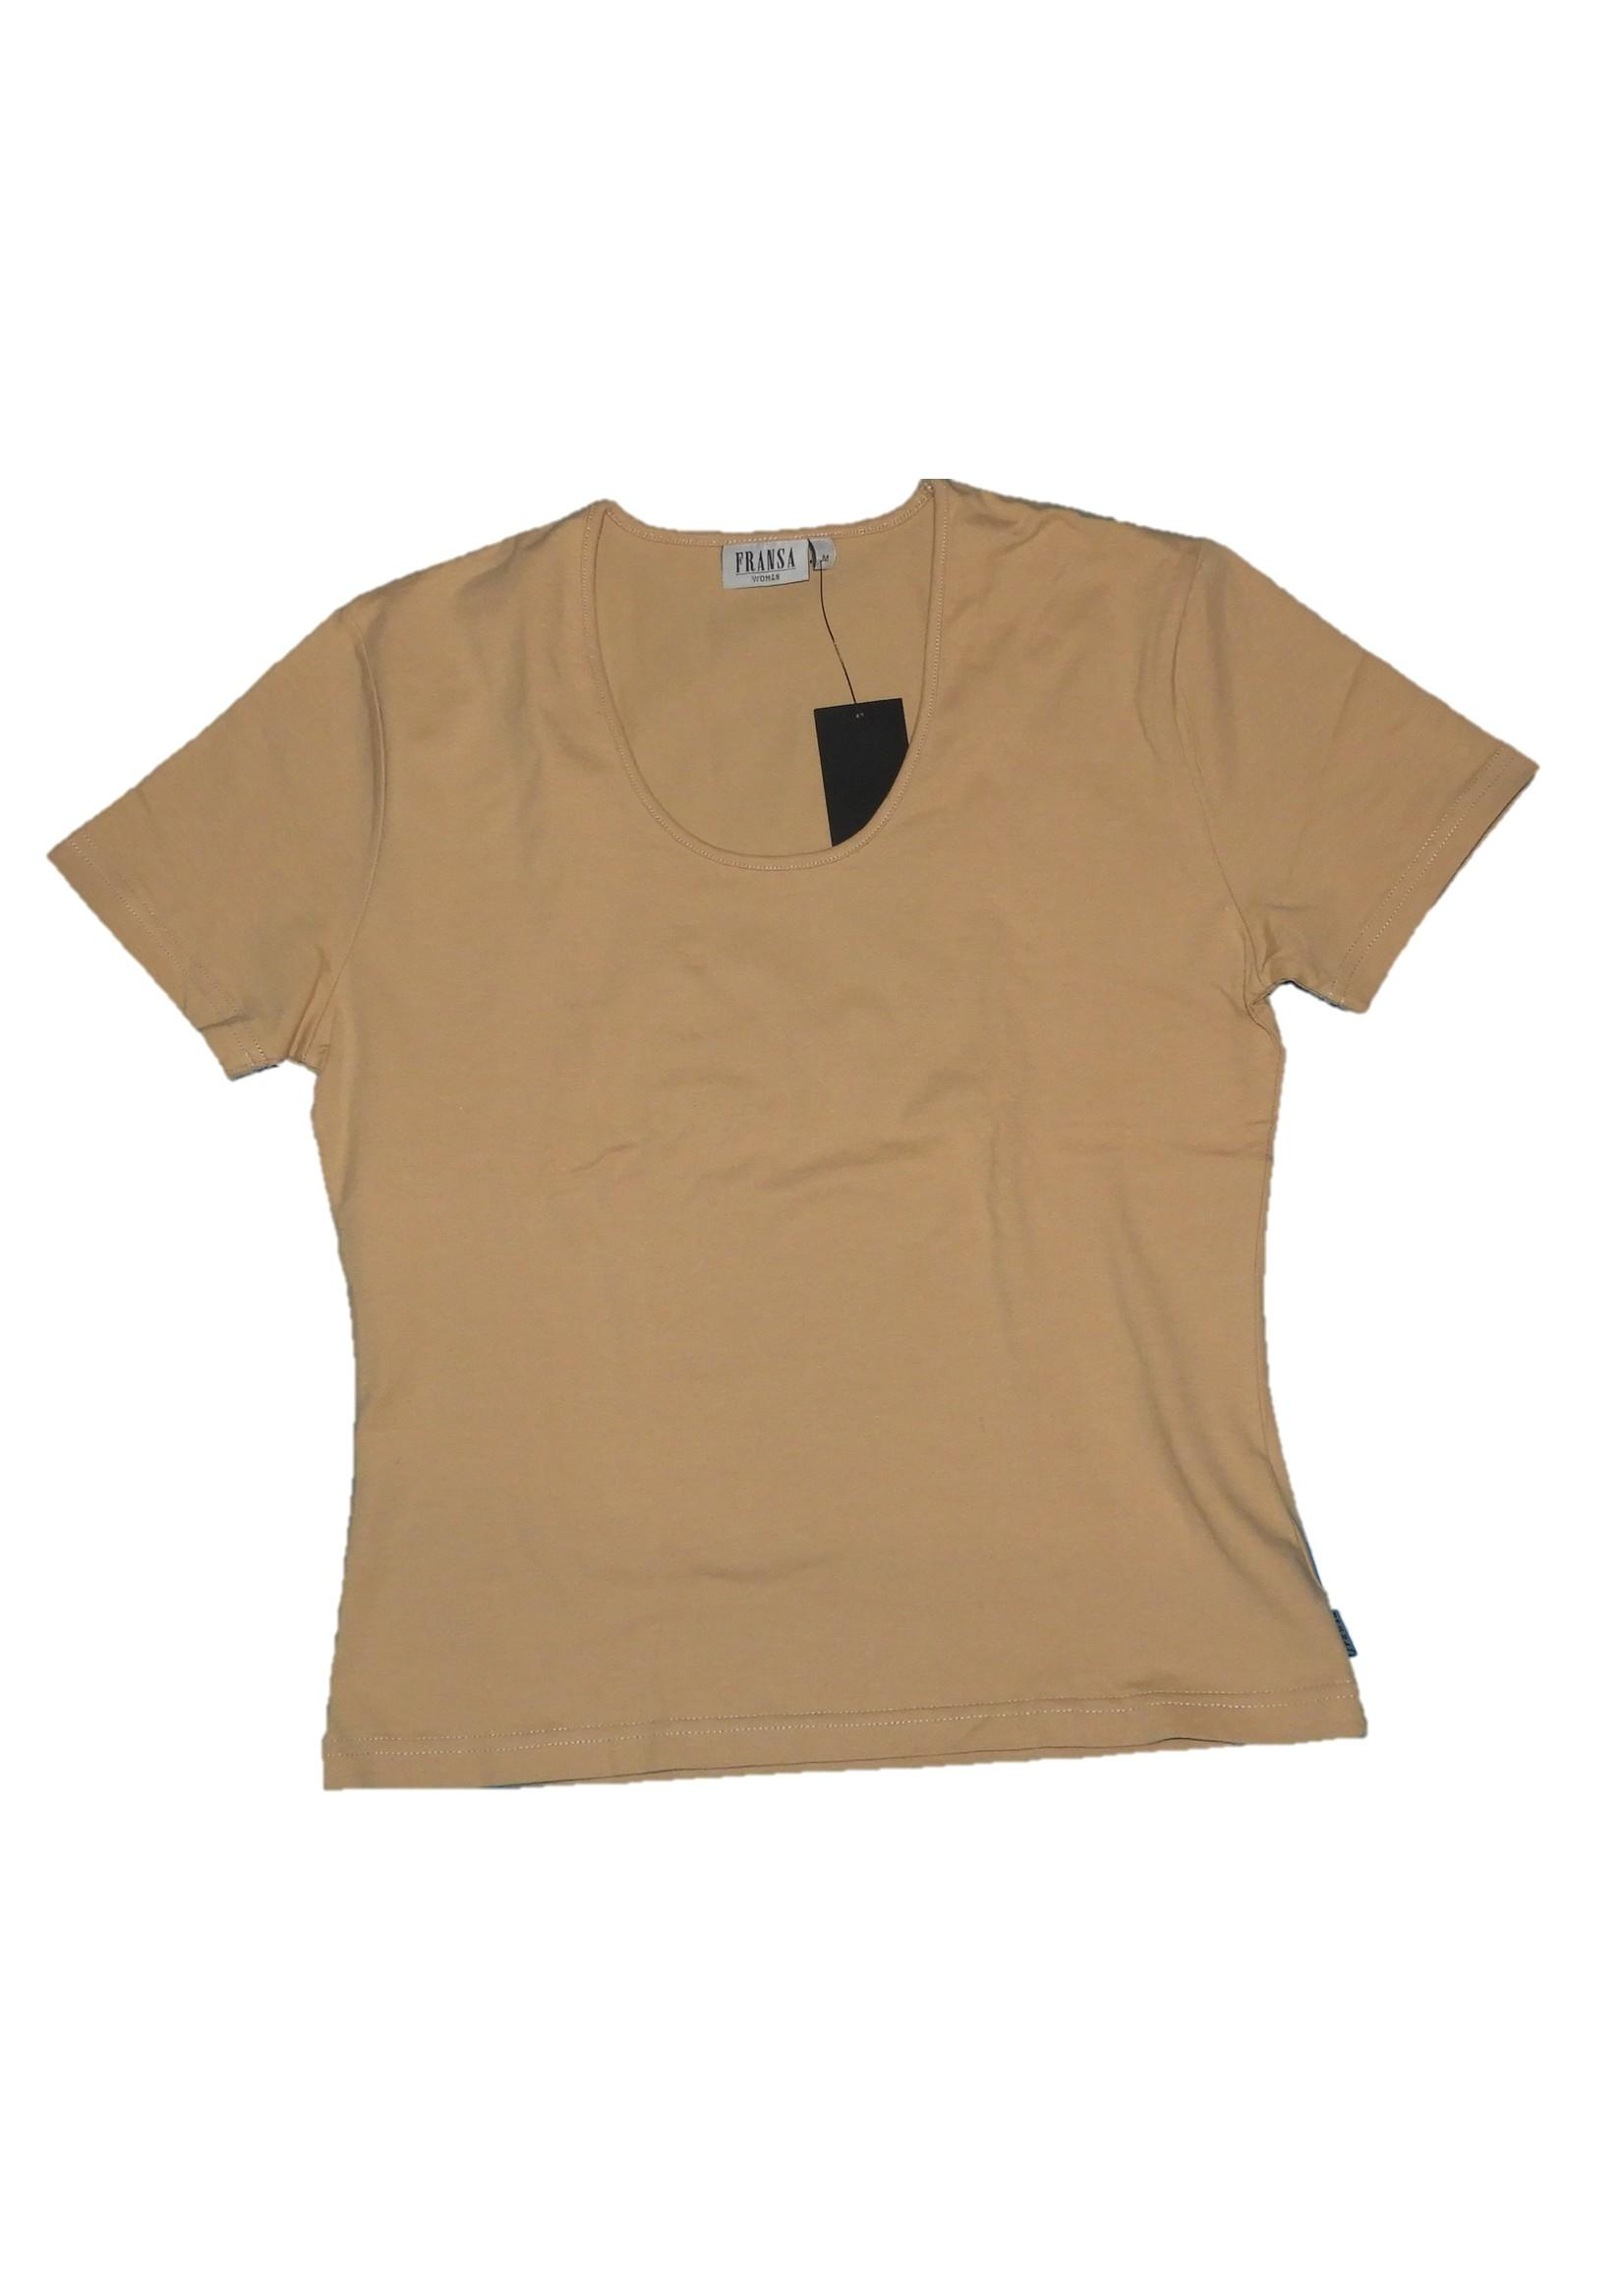 Fransa T-shirt maat M